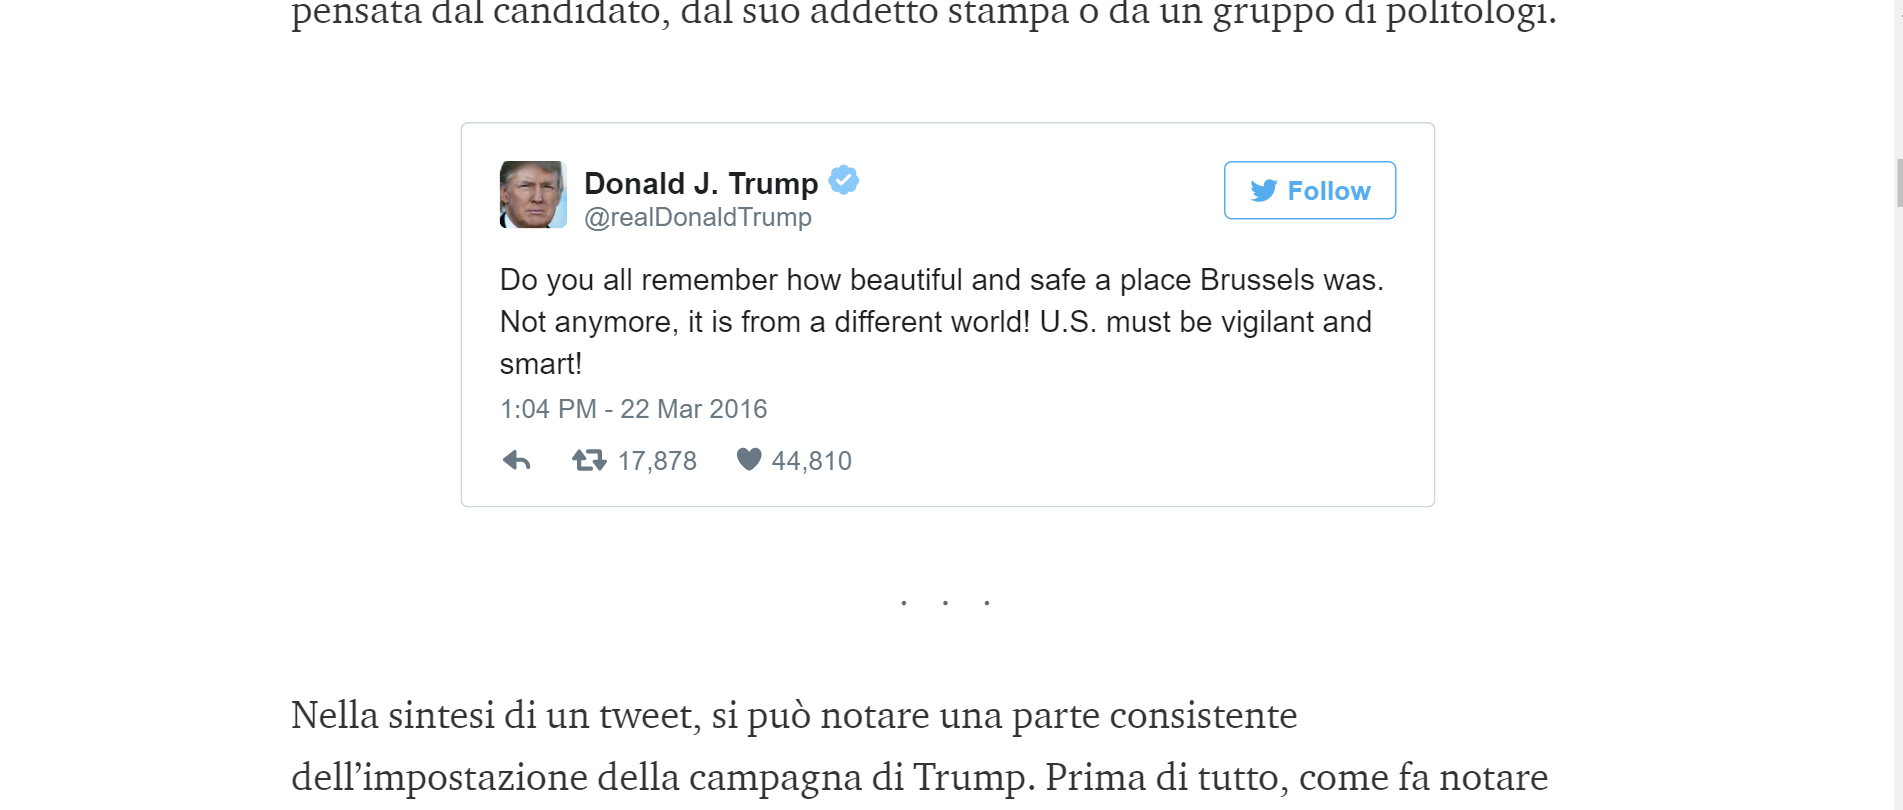 Il tweet di Trump su Bruxelles — In italiano — Medium